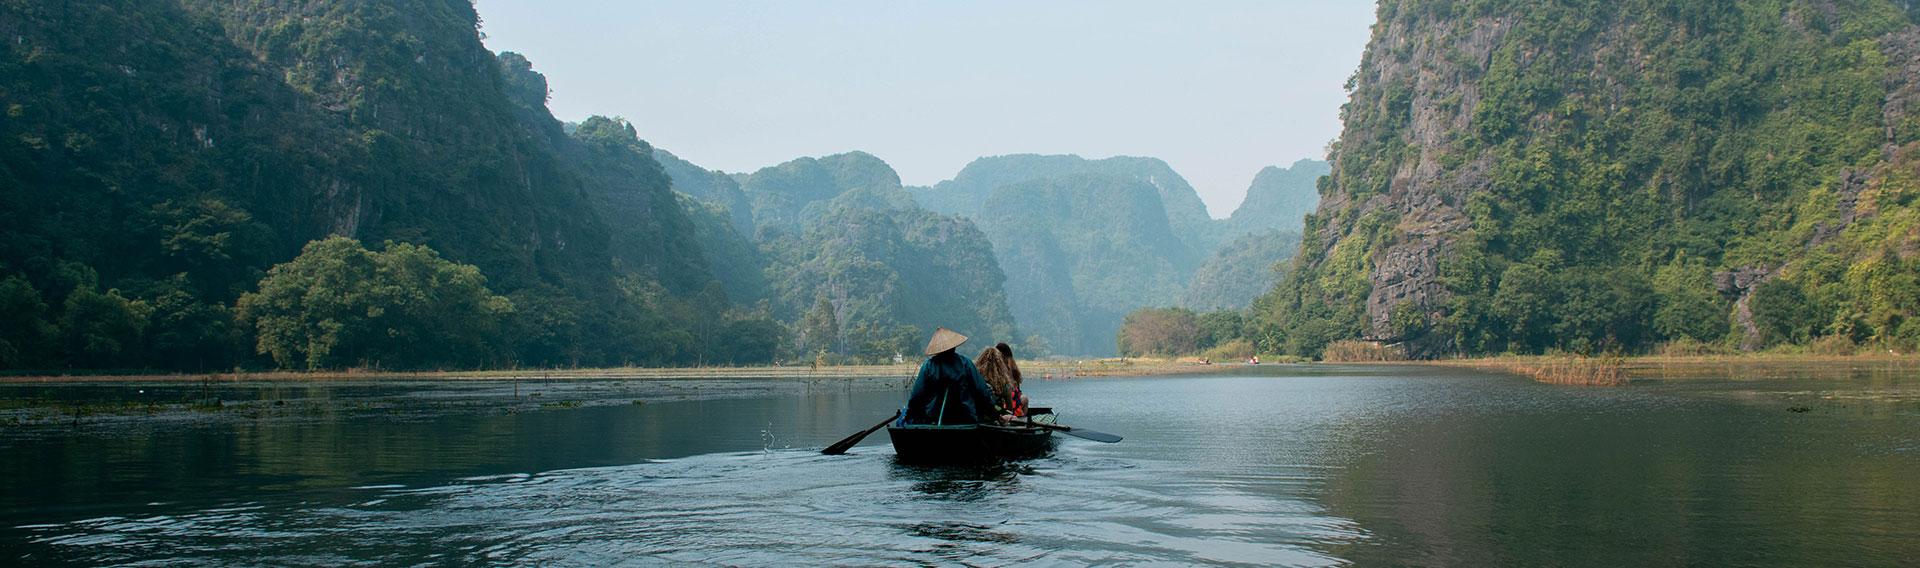 Vietnam, Ninh Binh, Boat cruise